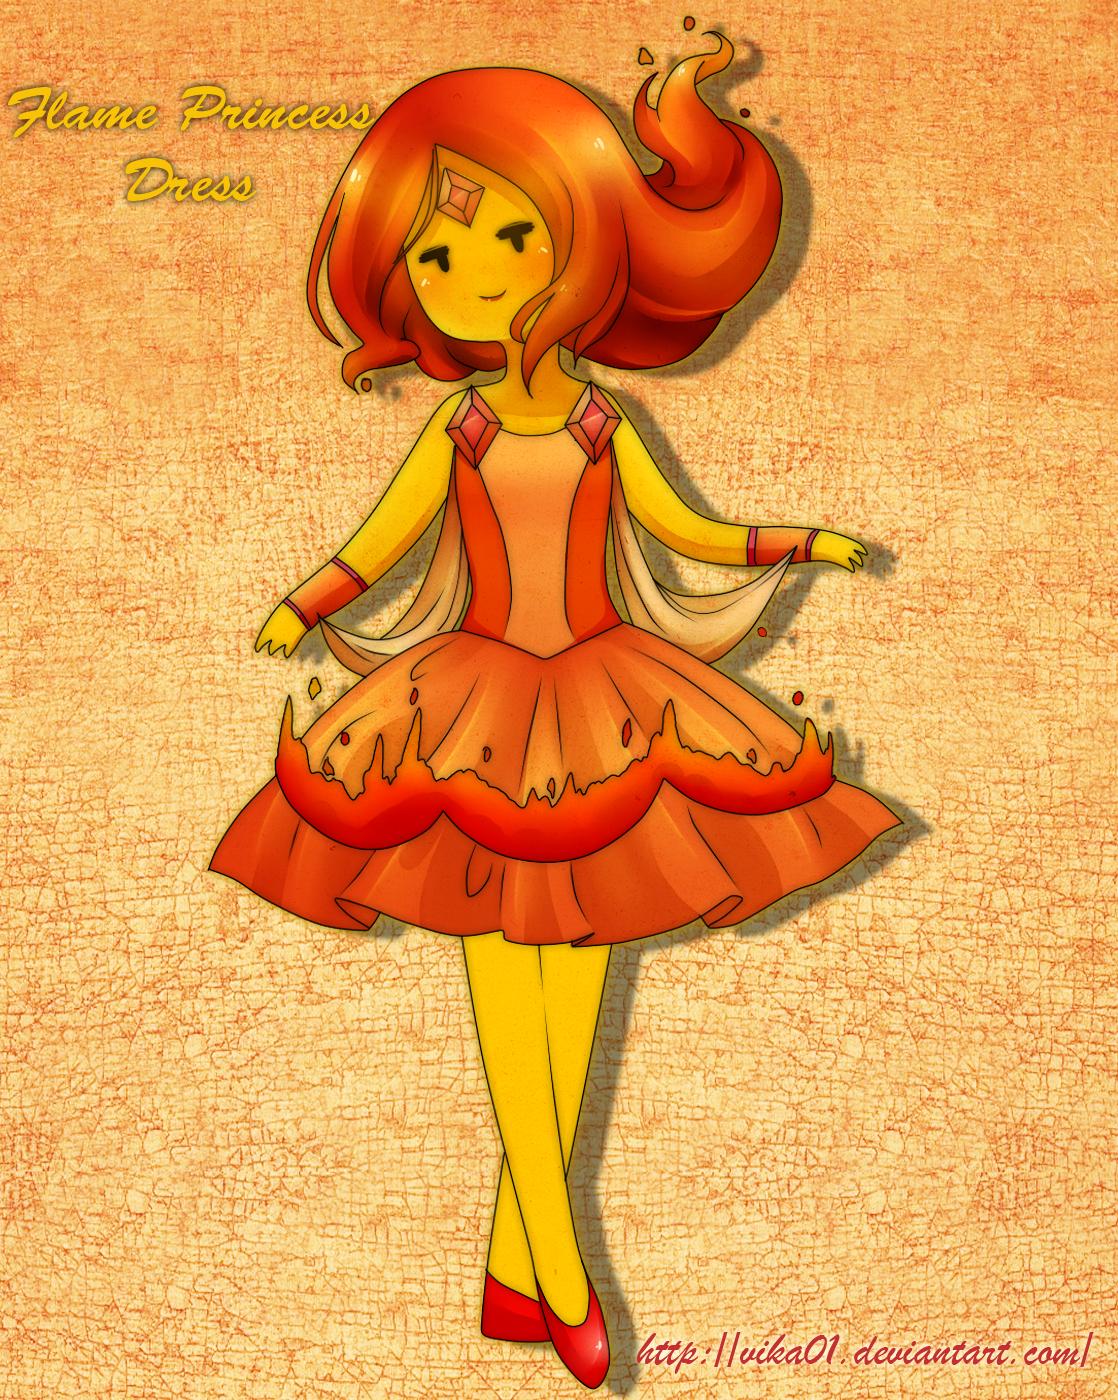 flame princess - Flame Princess Photo (34388939) - Fanpop